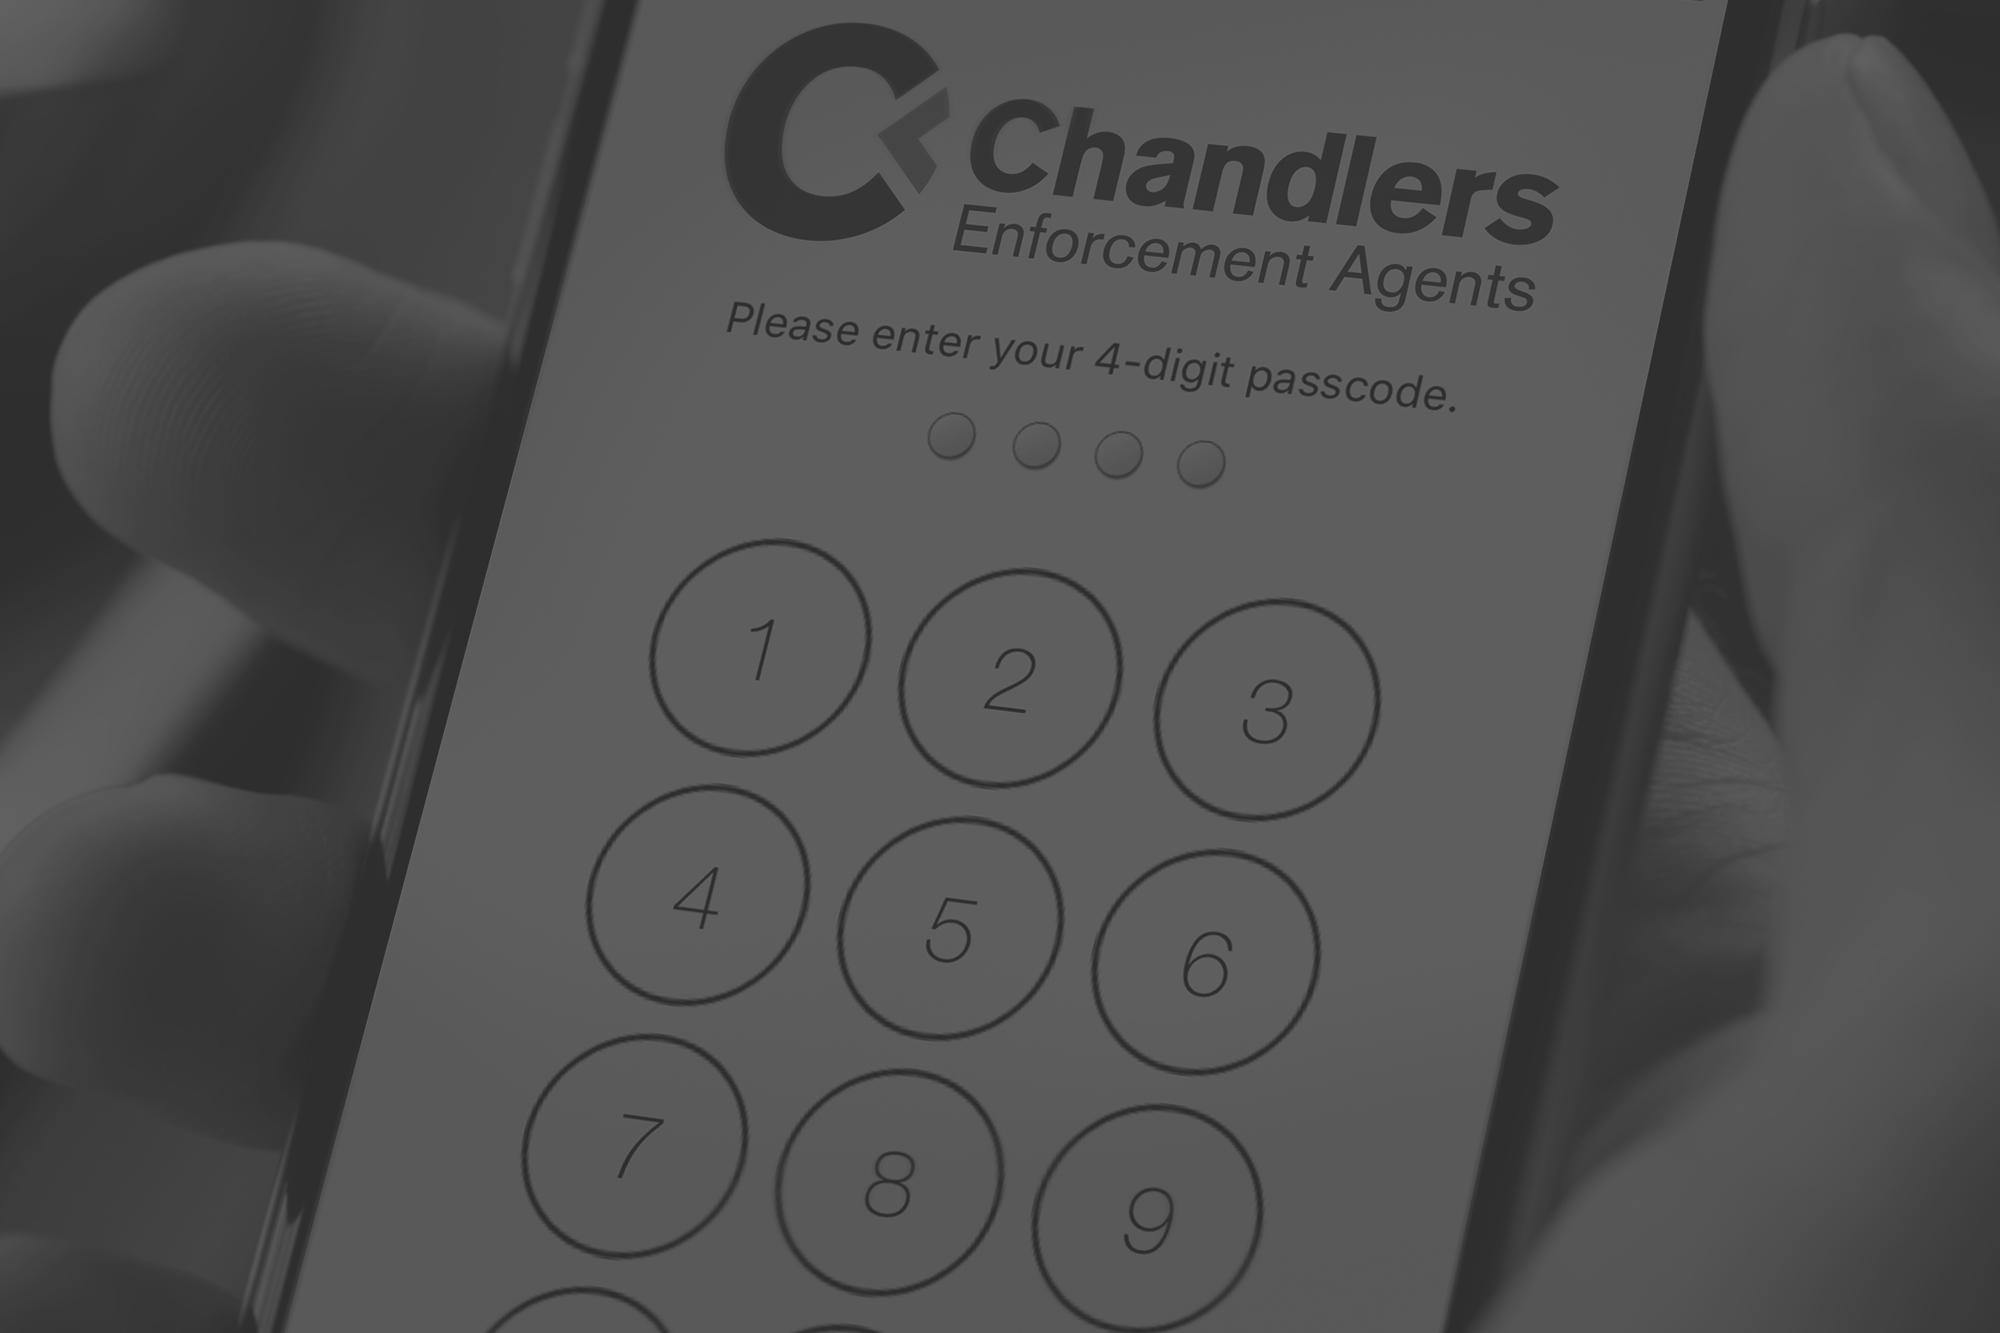 chandlers_close_up_phone_screen_bog_2000x1333